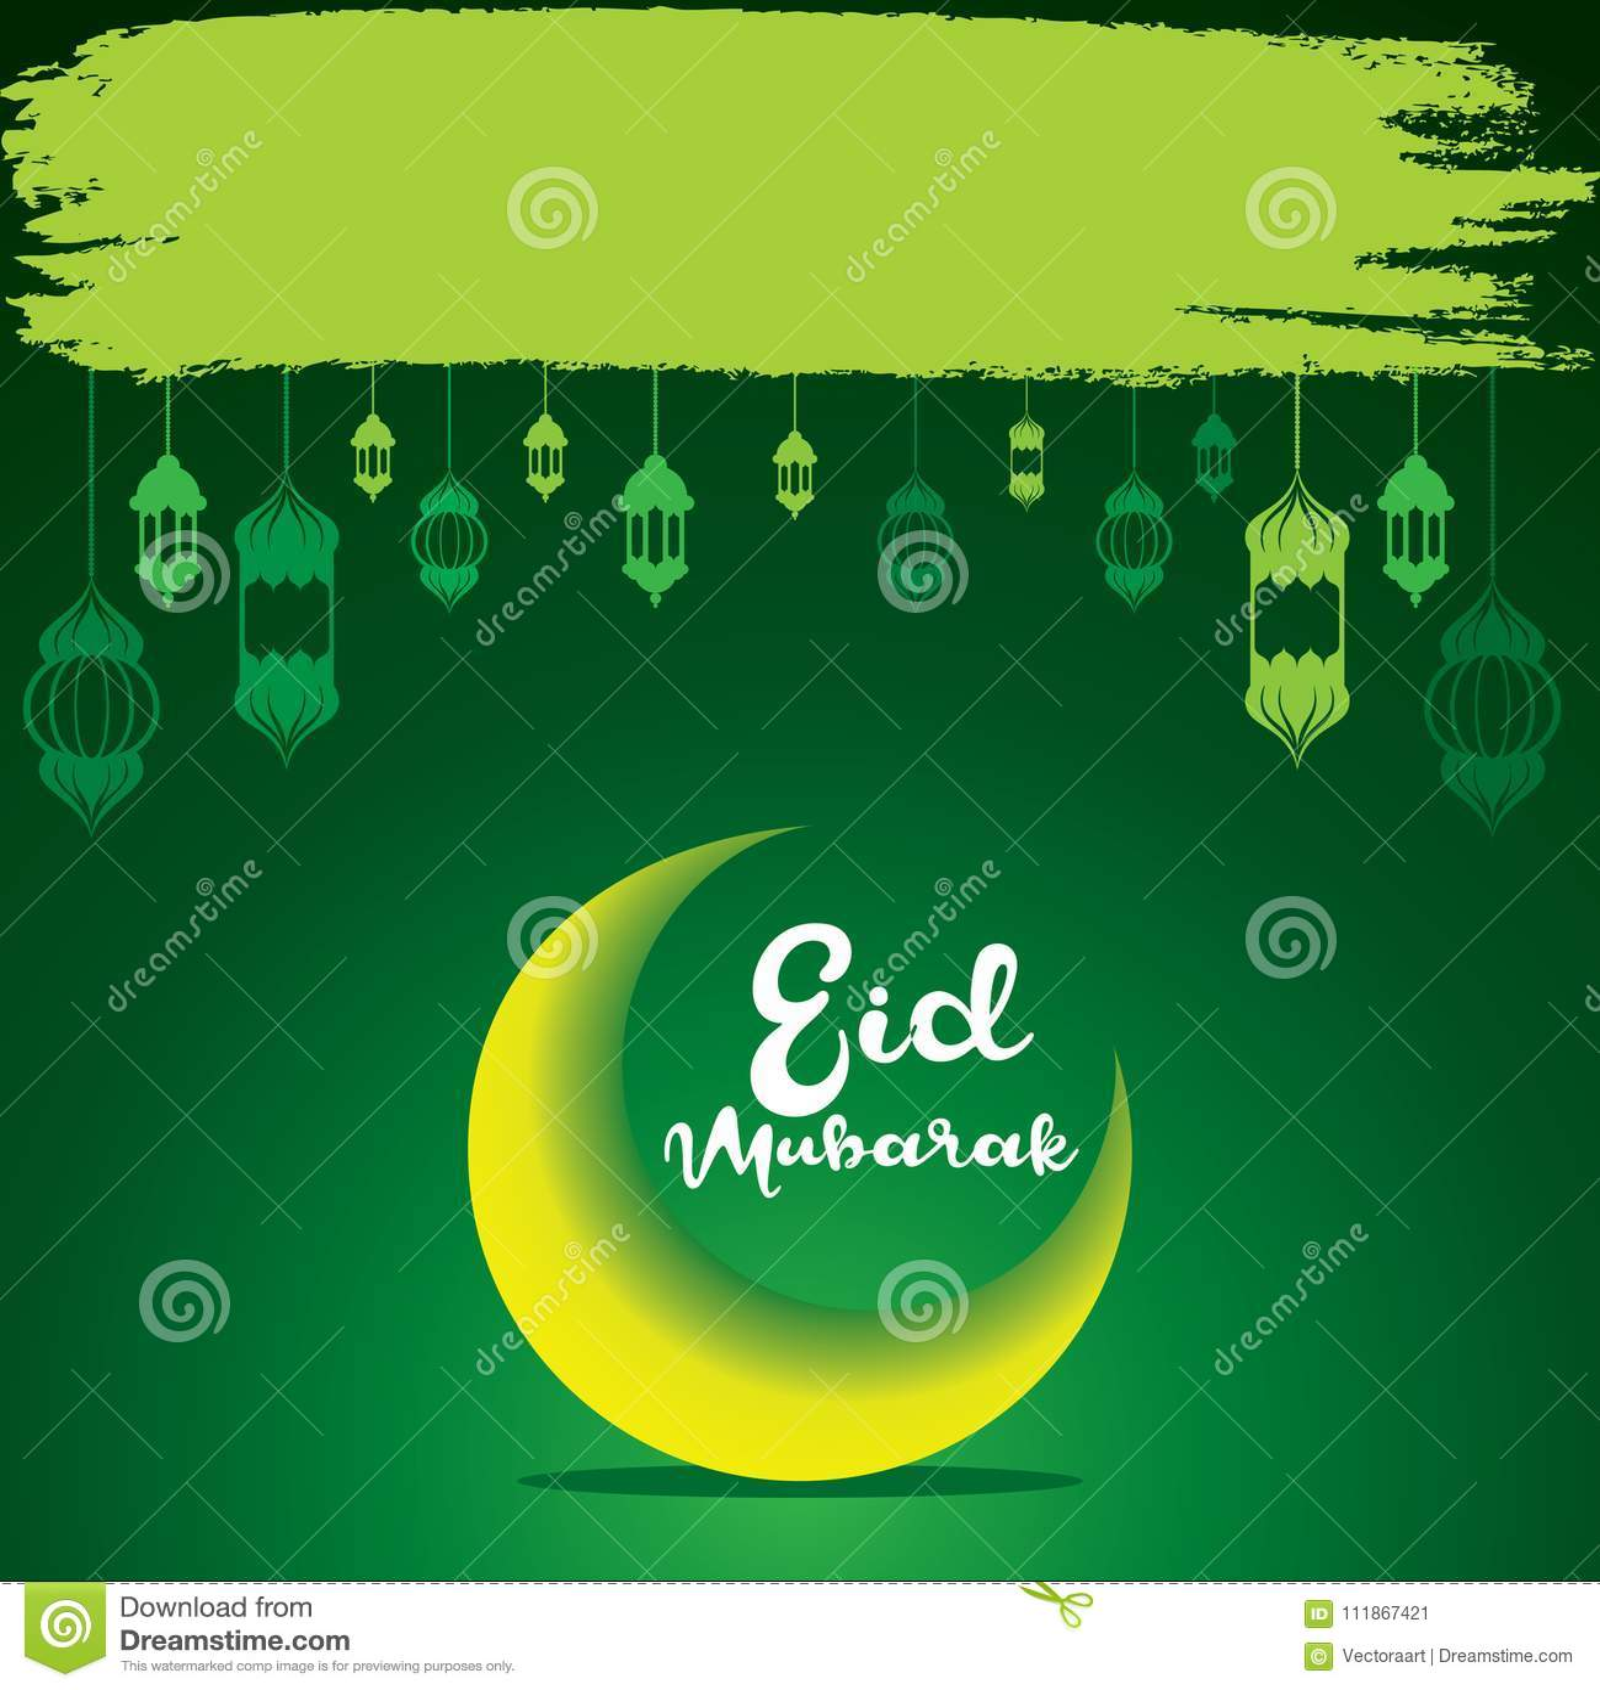 Happy eid mubarak greeting design stock vector illustration of download happy eid mubarak greeting design stock vector illustration of invitation kareem 111867421 m4hsunfo